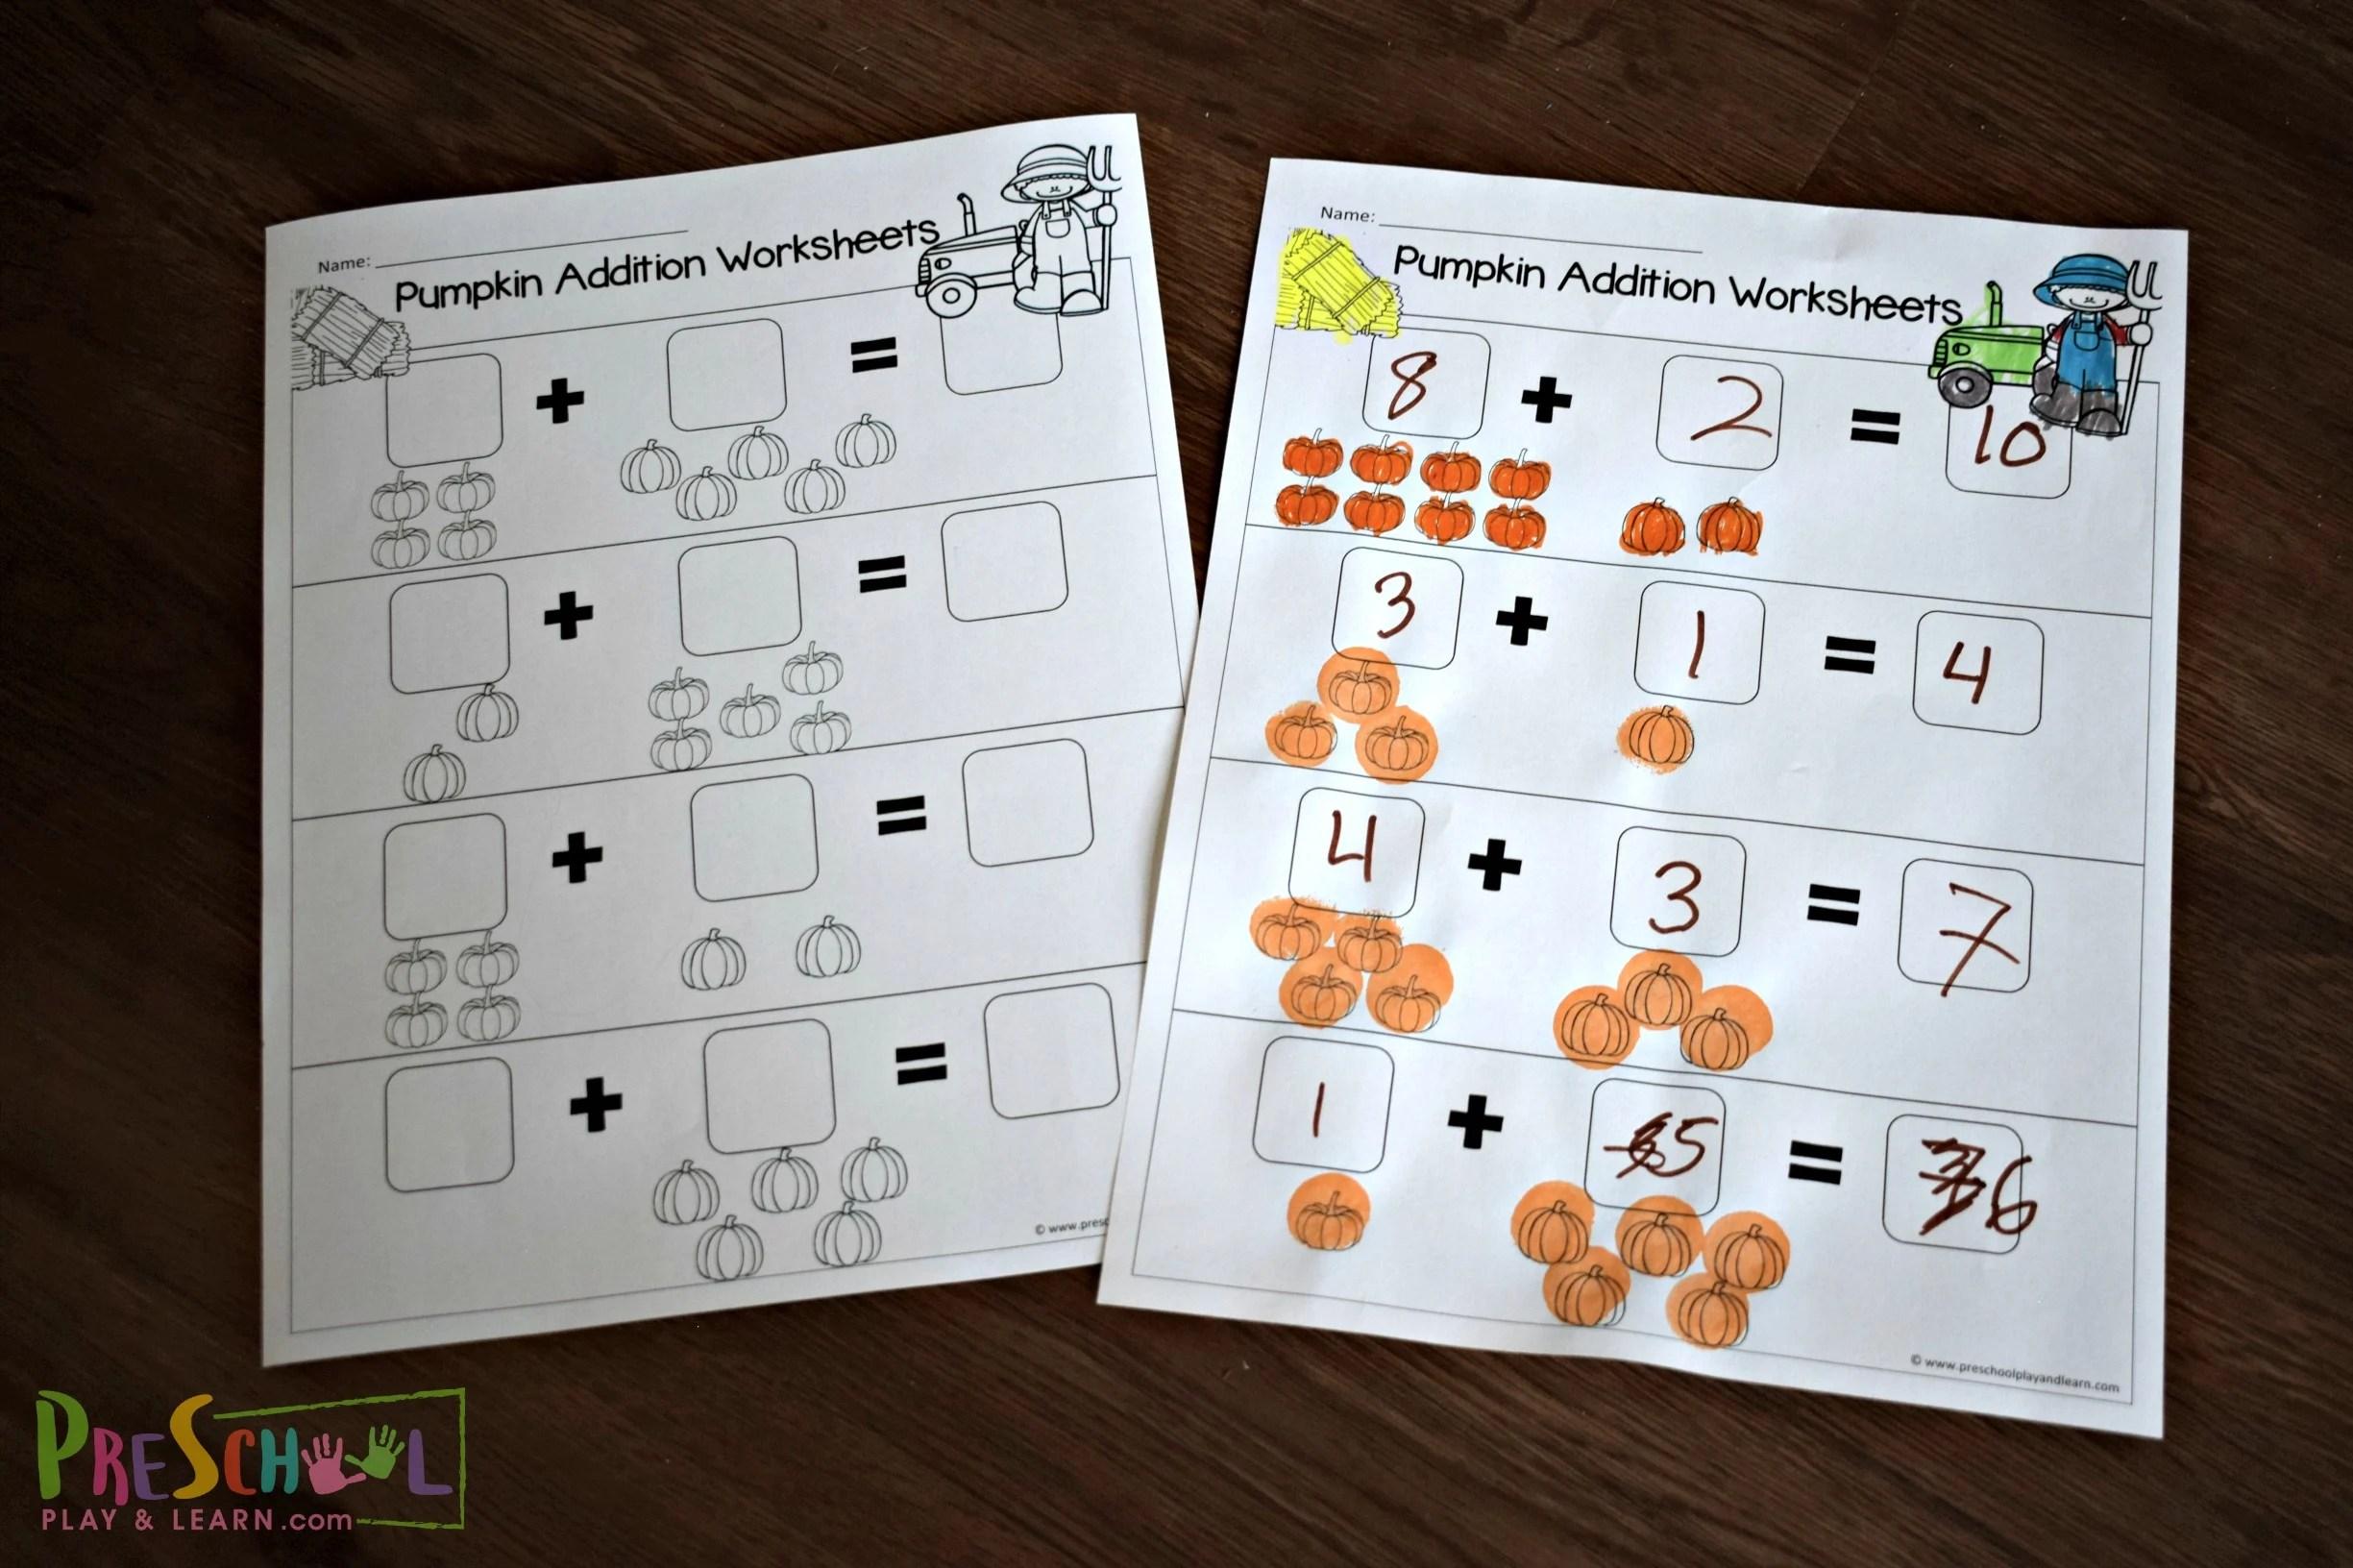 Pumpkin Addition Worksheets For Preschoolers